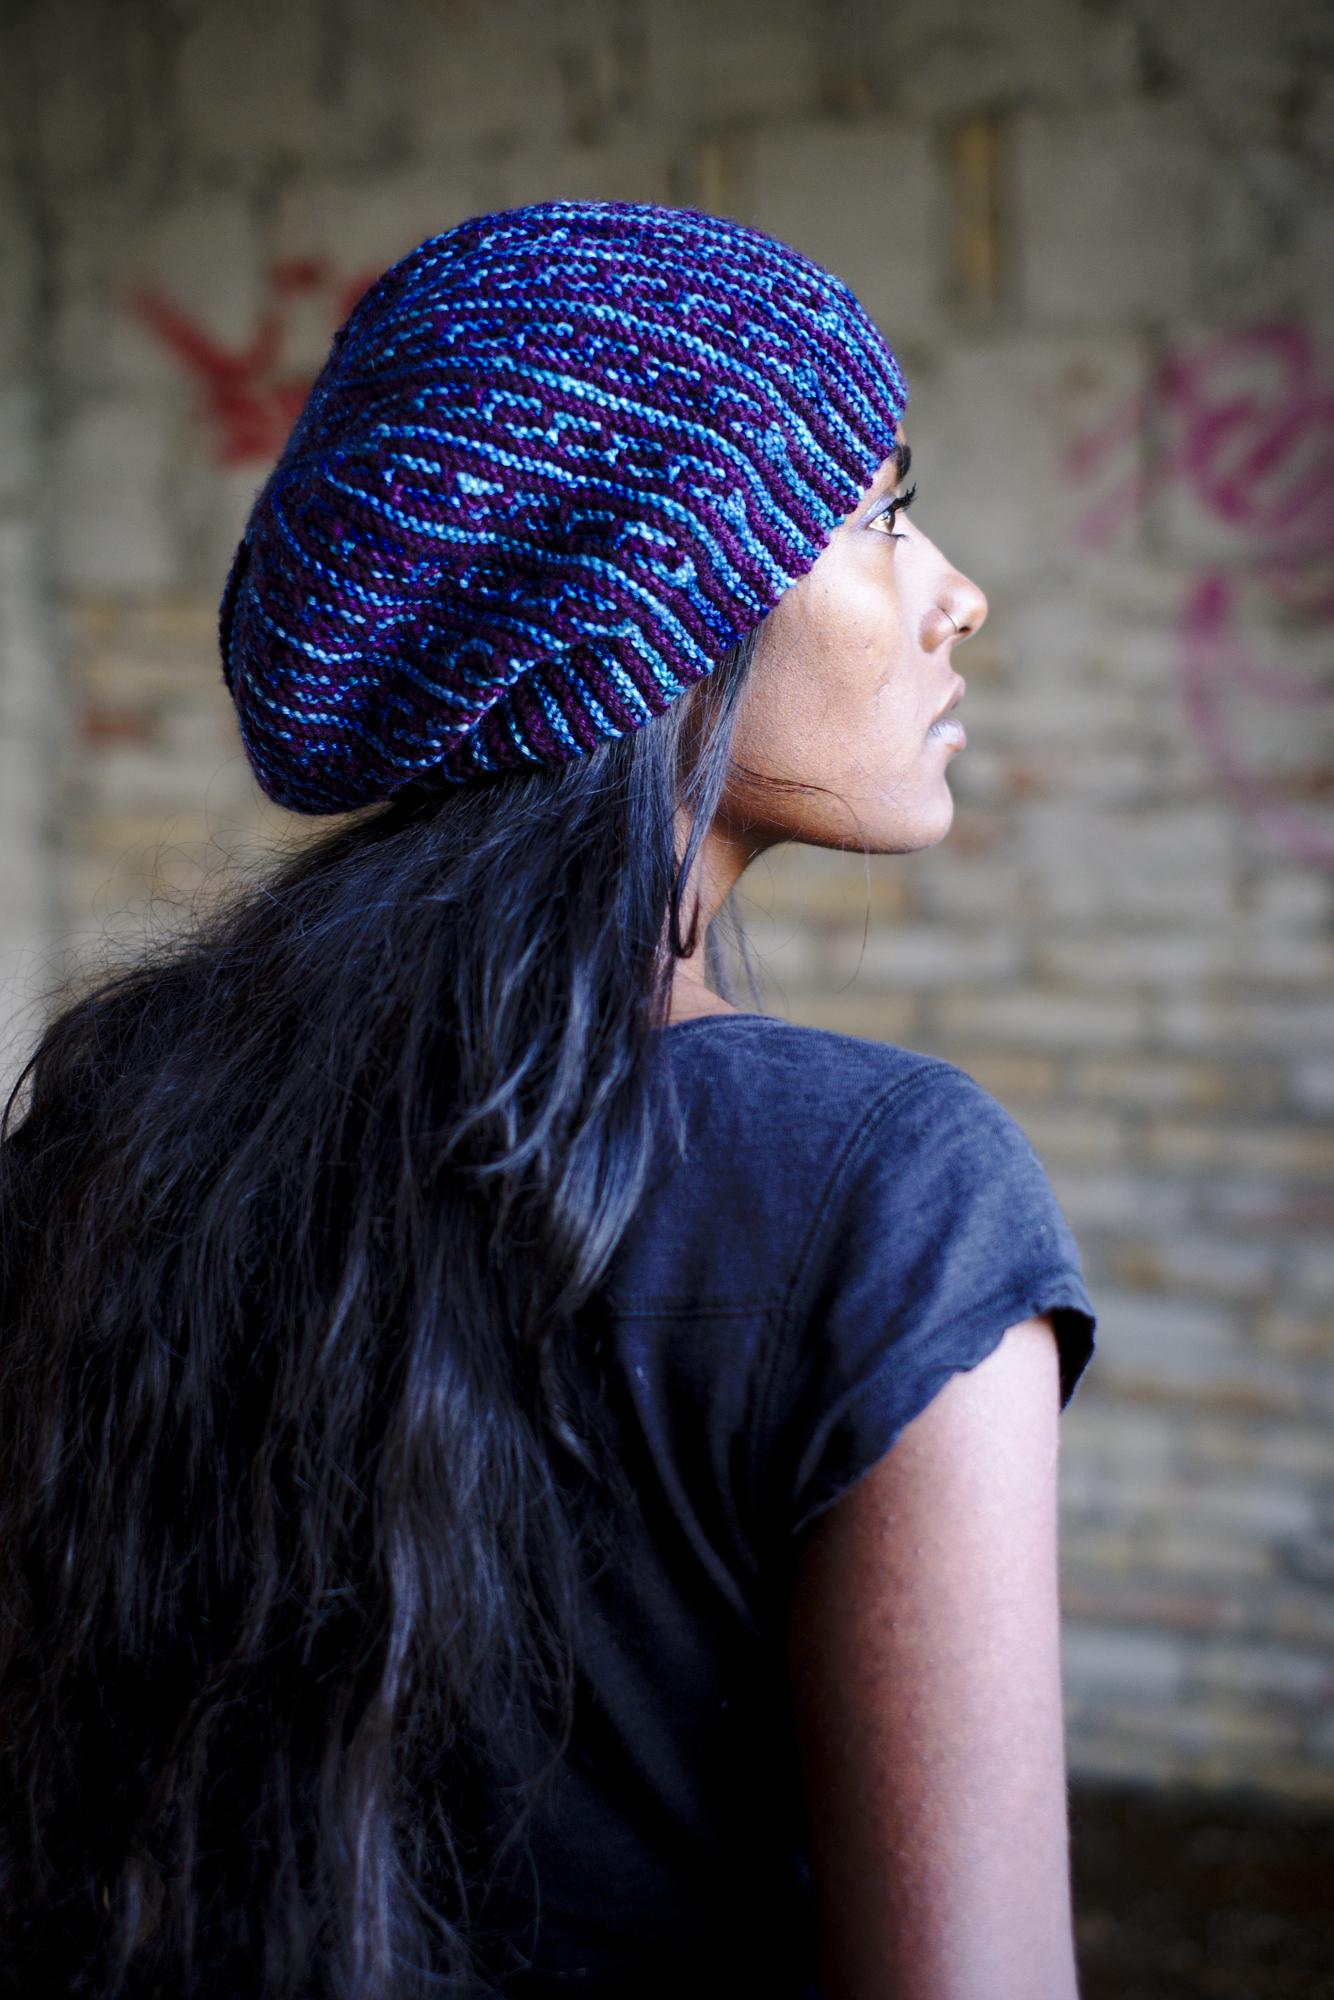 High Rise sideways knit mosaic hat knitting pattern for dk weight yarn